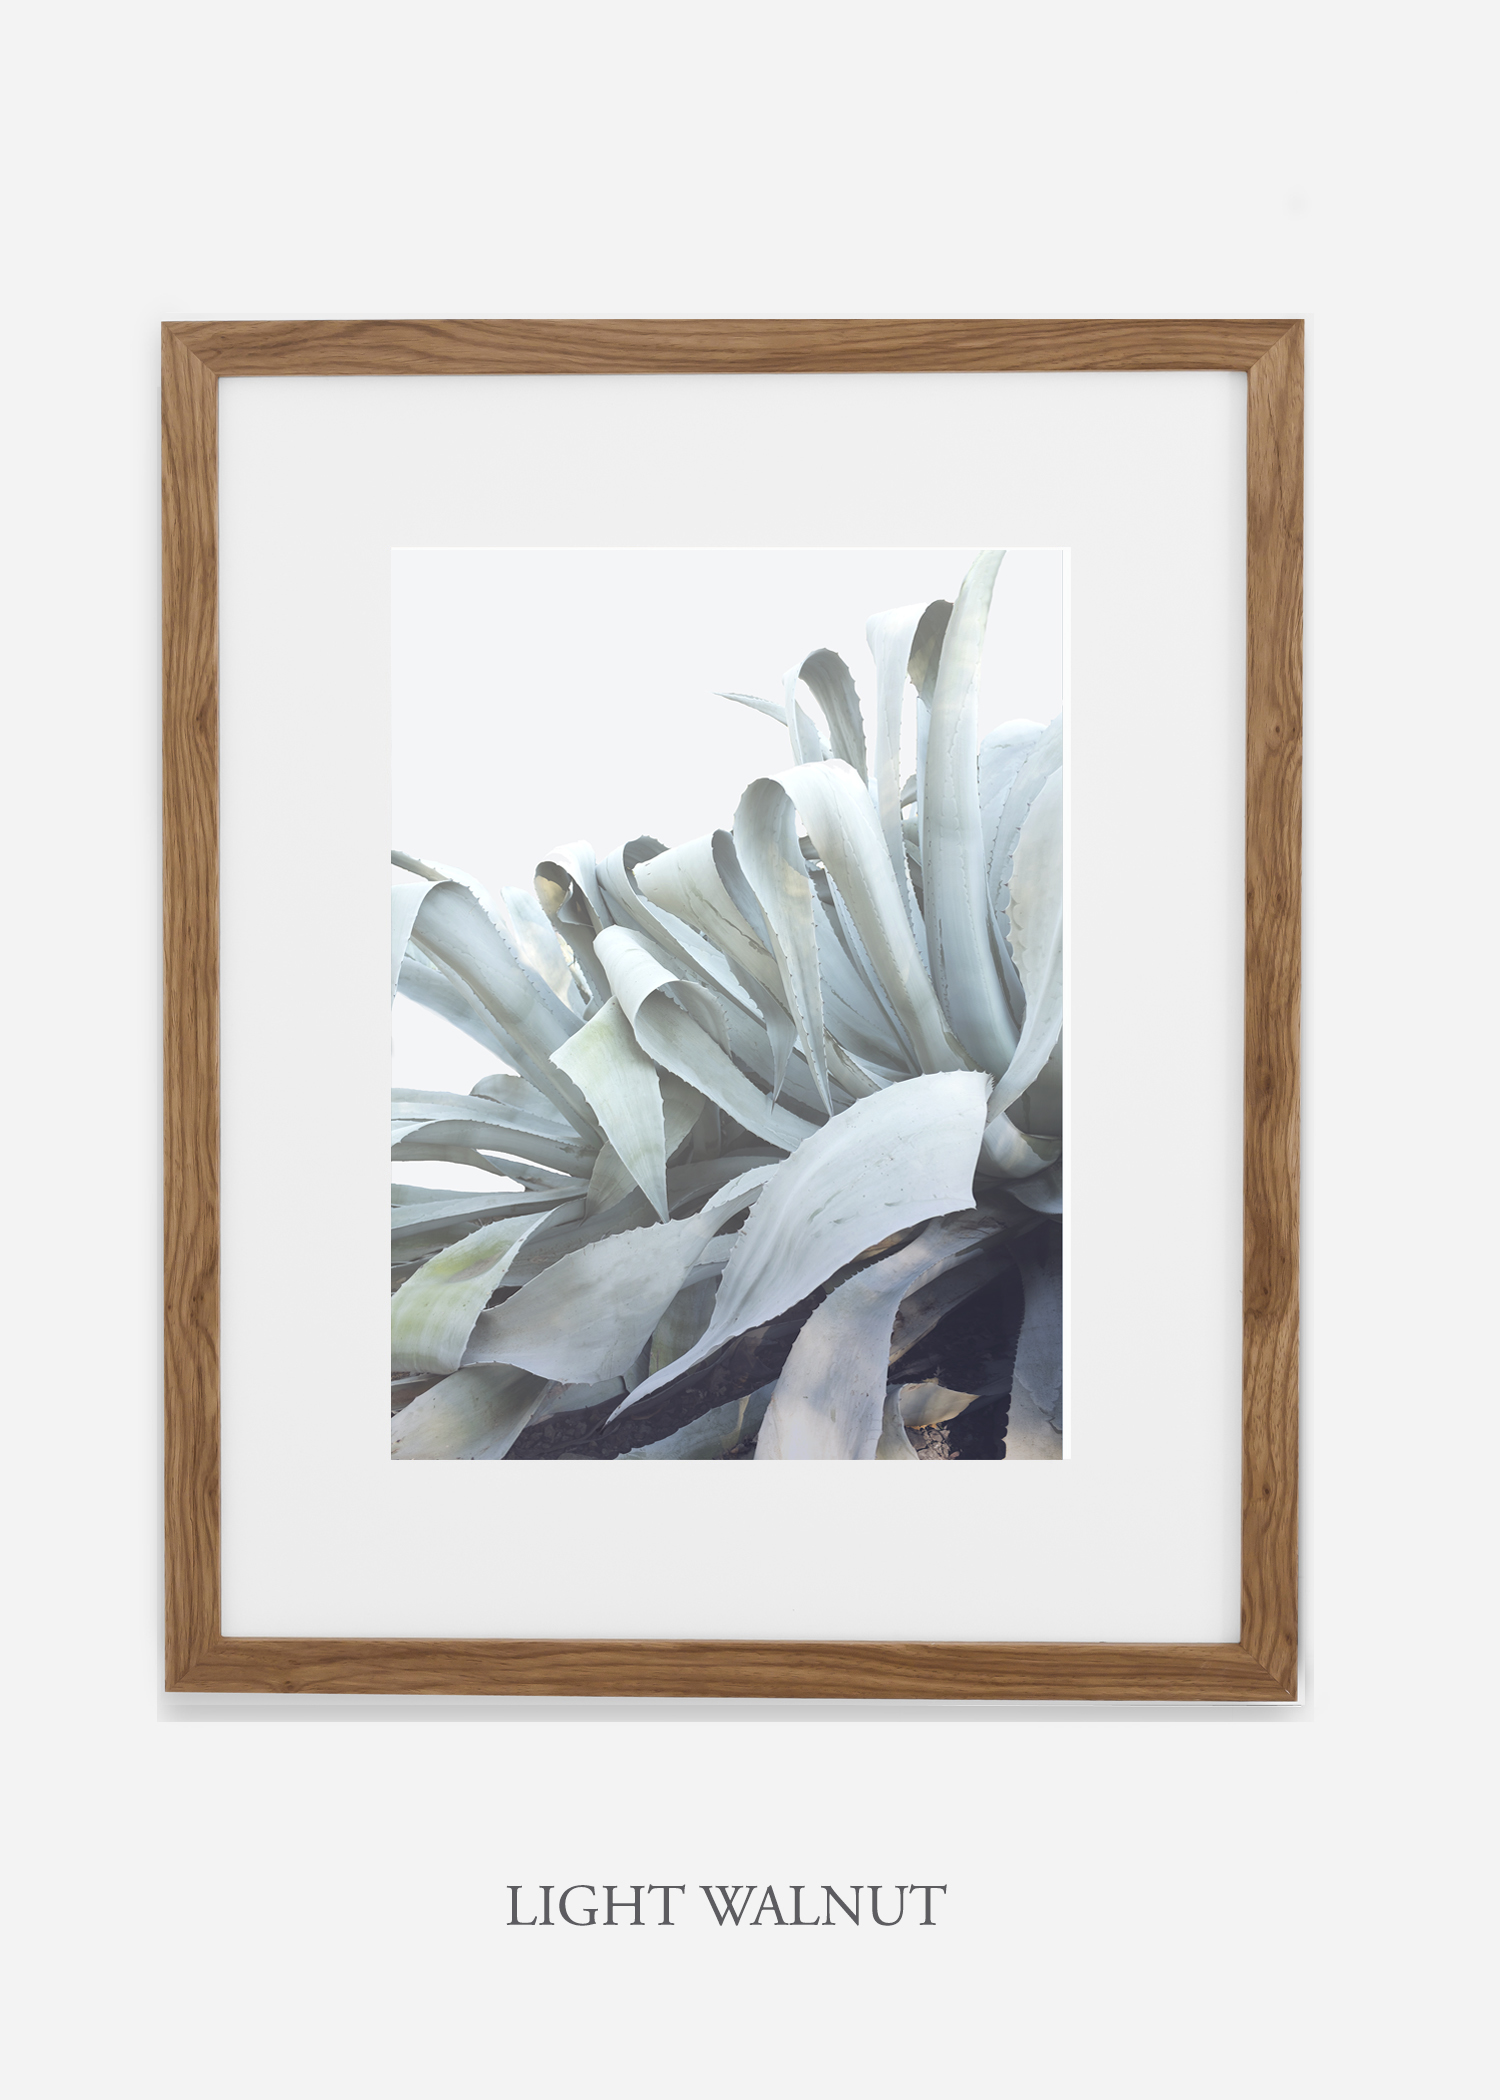 wildercalifornia_lightwalnutframe_WinterWhite_AgaveNo.2_Desert_LosAngeles_Art_HomeDecor_interiordesign_design.jpg